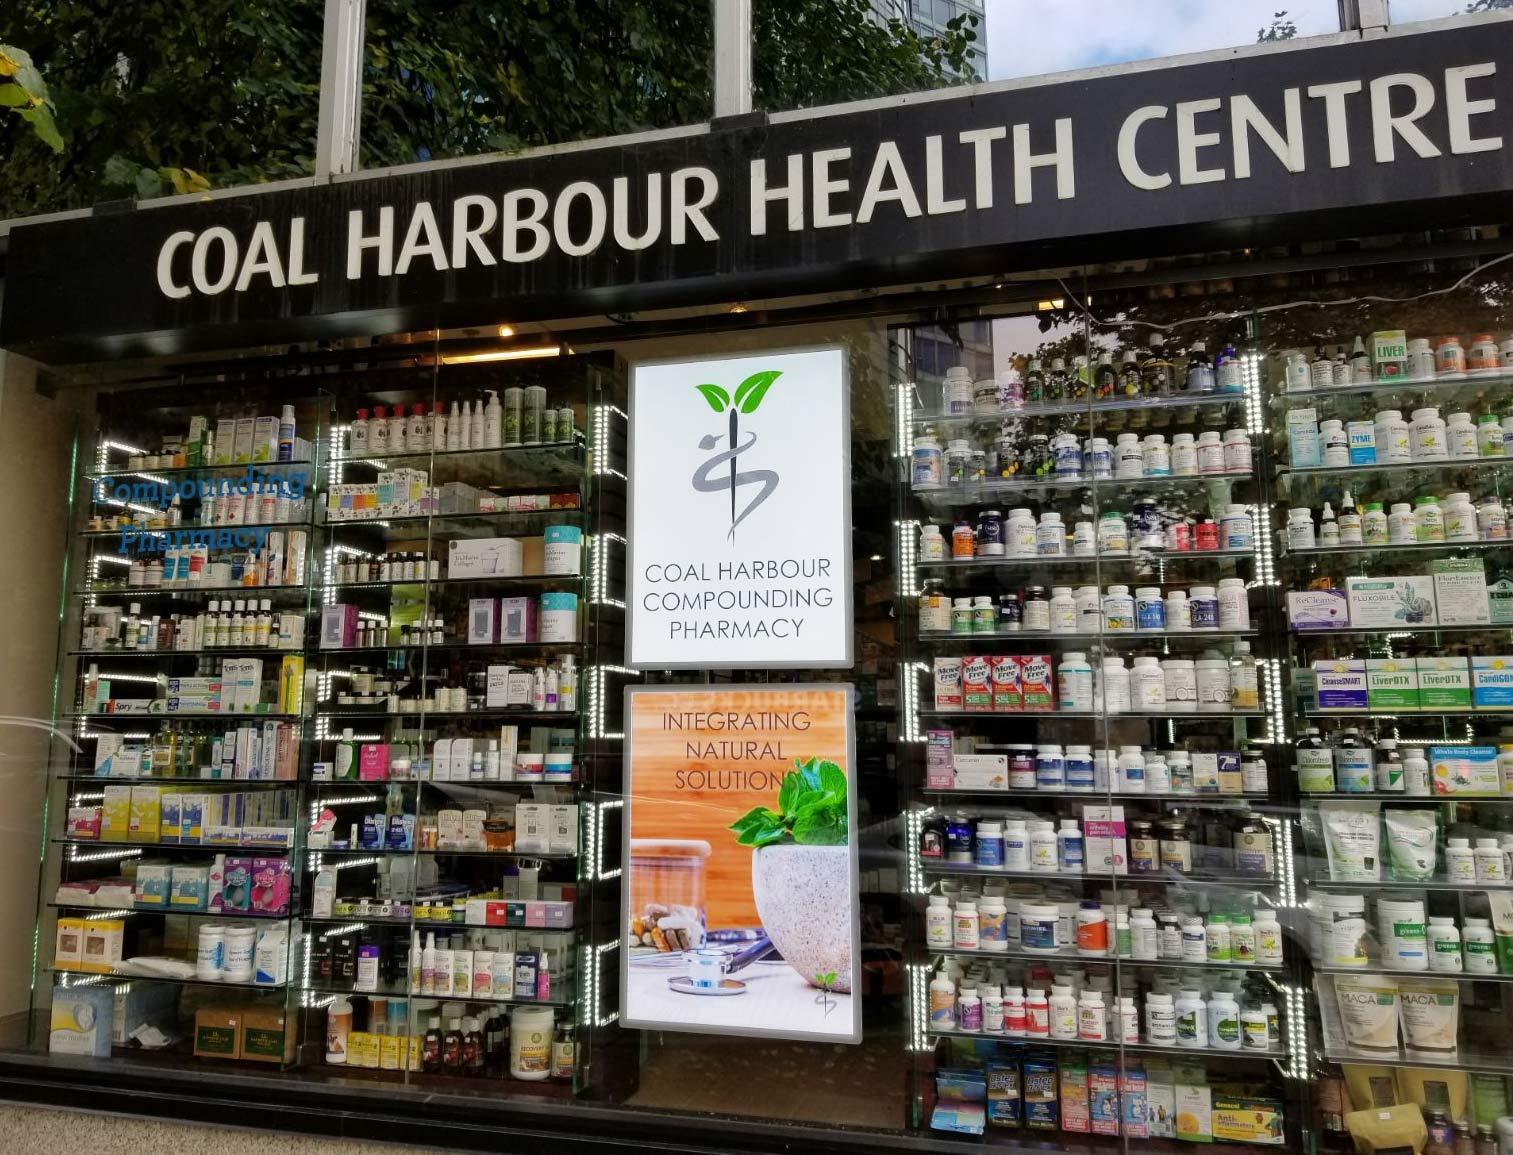 Coal Harbour Health Centre